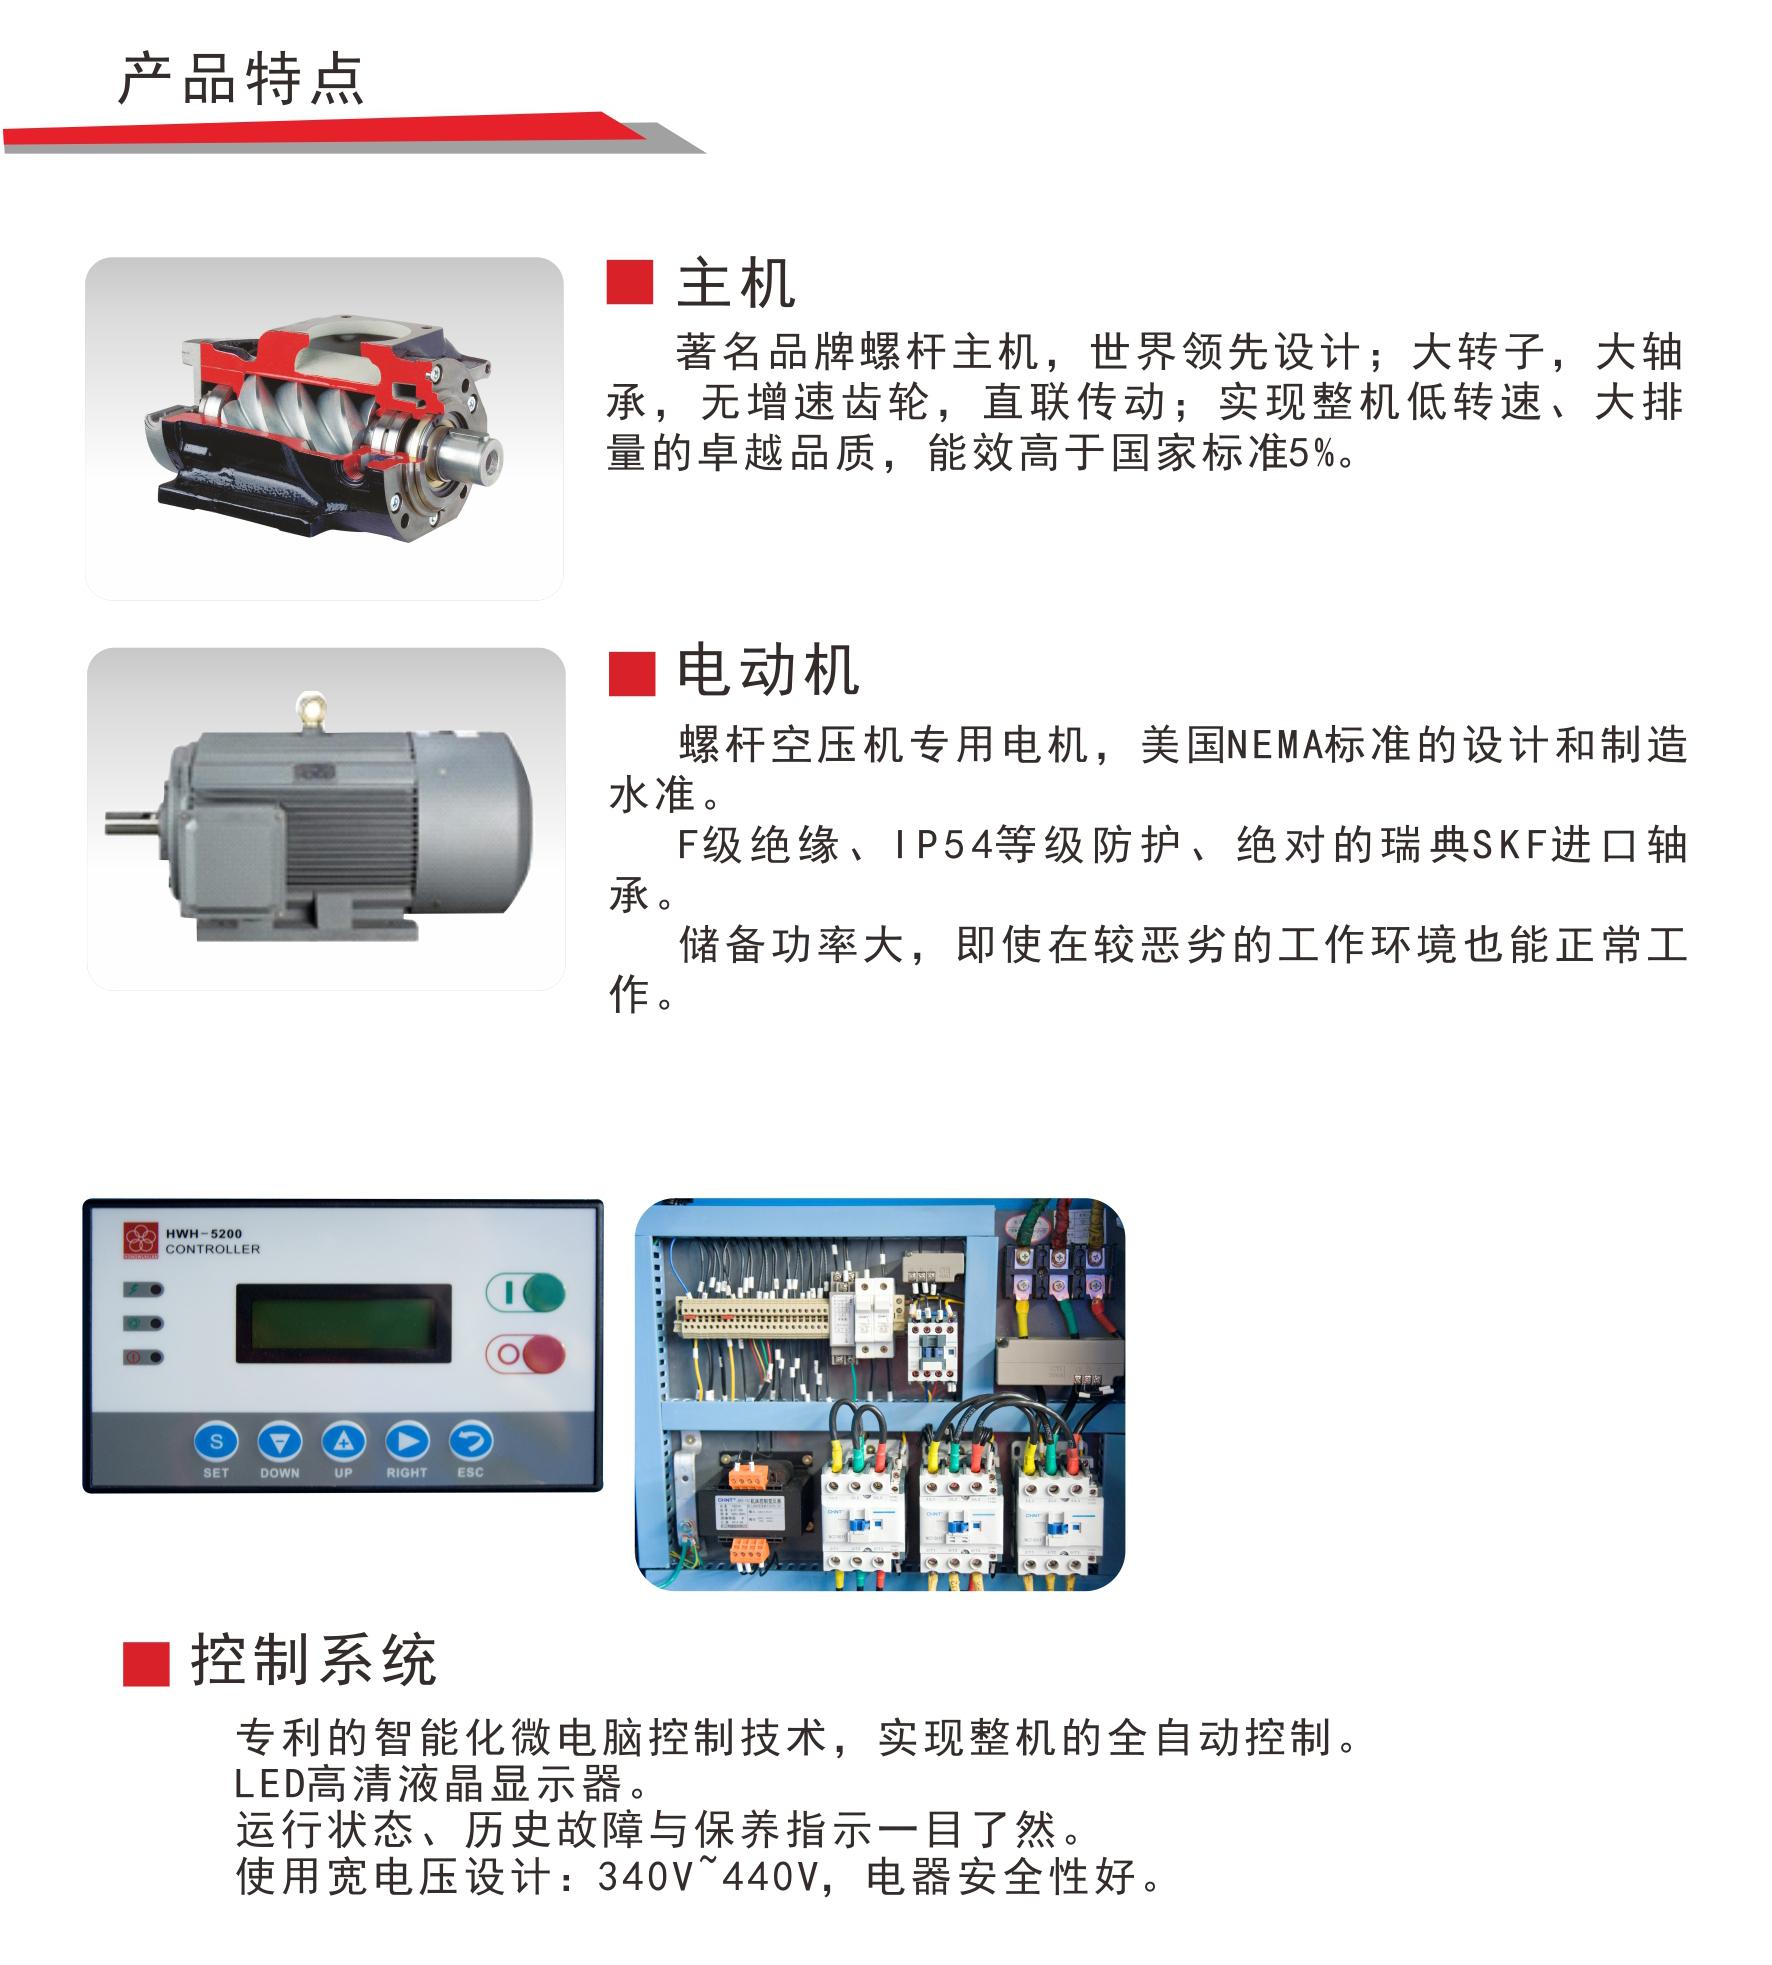 JA系列工程专用螺杆空压机-微信稿_02